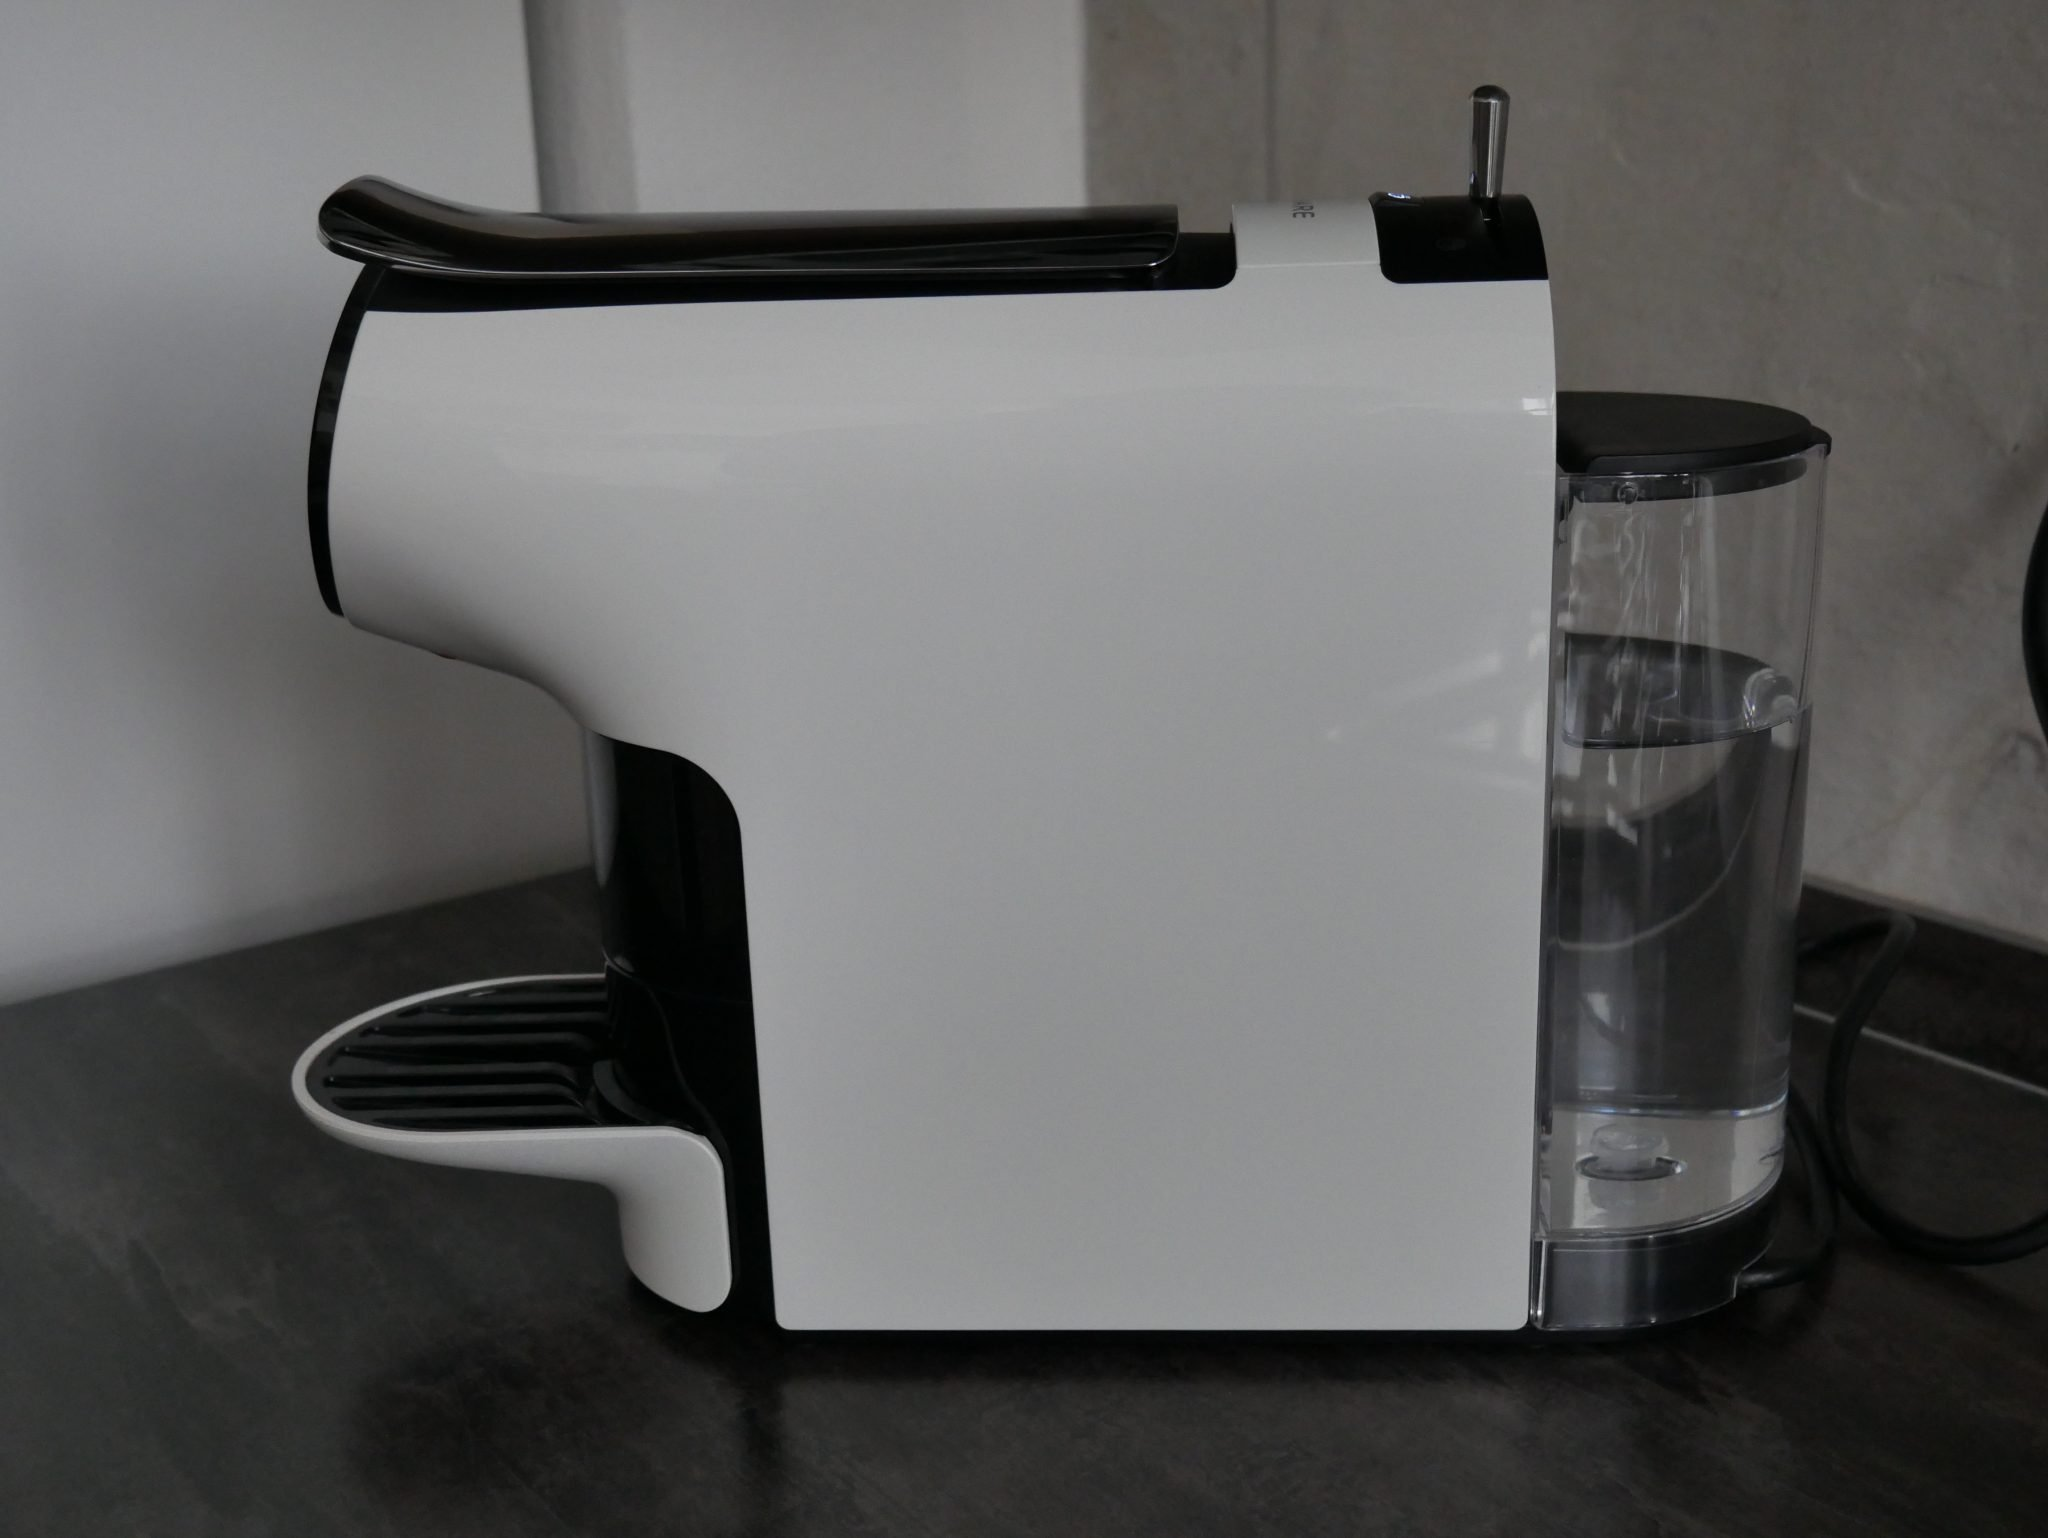 Xiaomi Schishare Nespresso